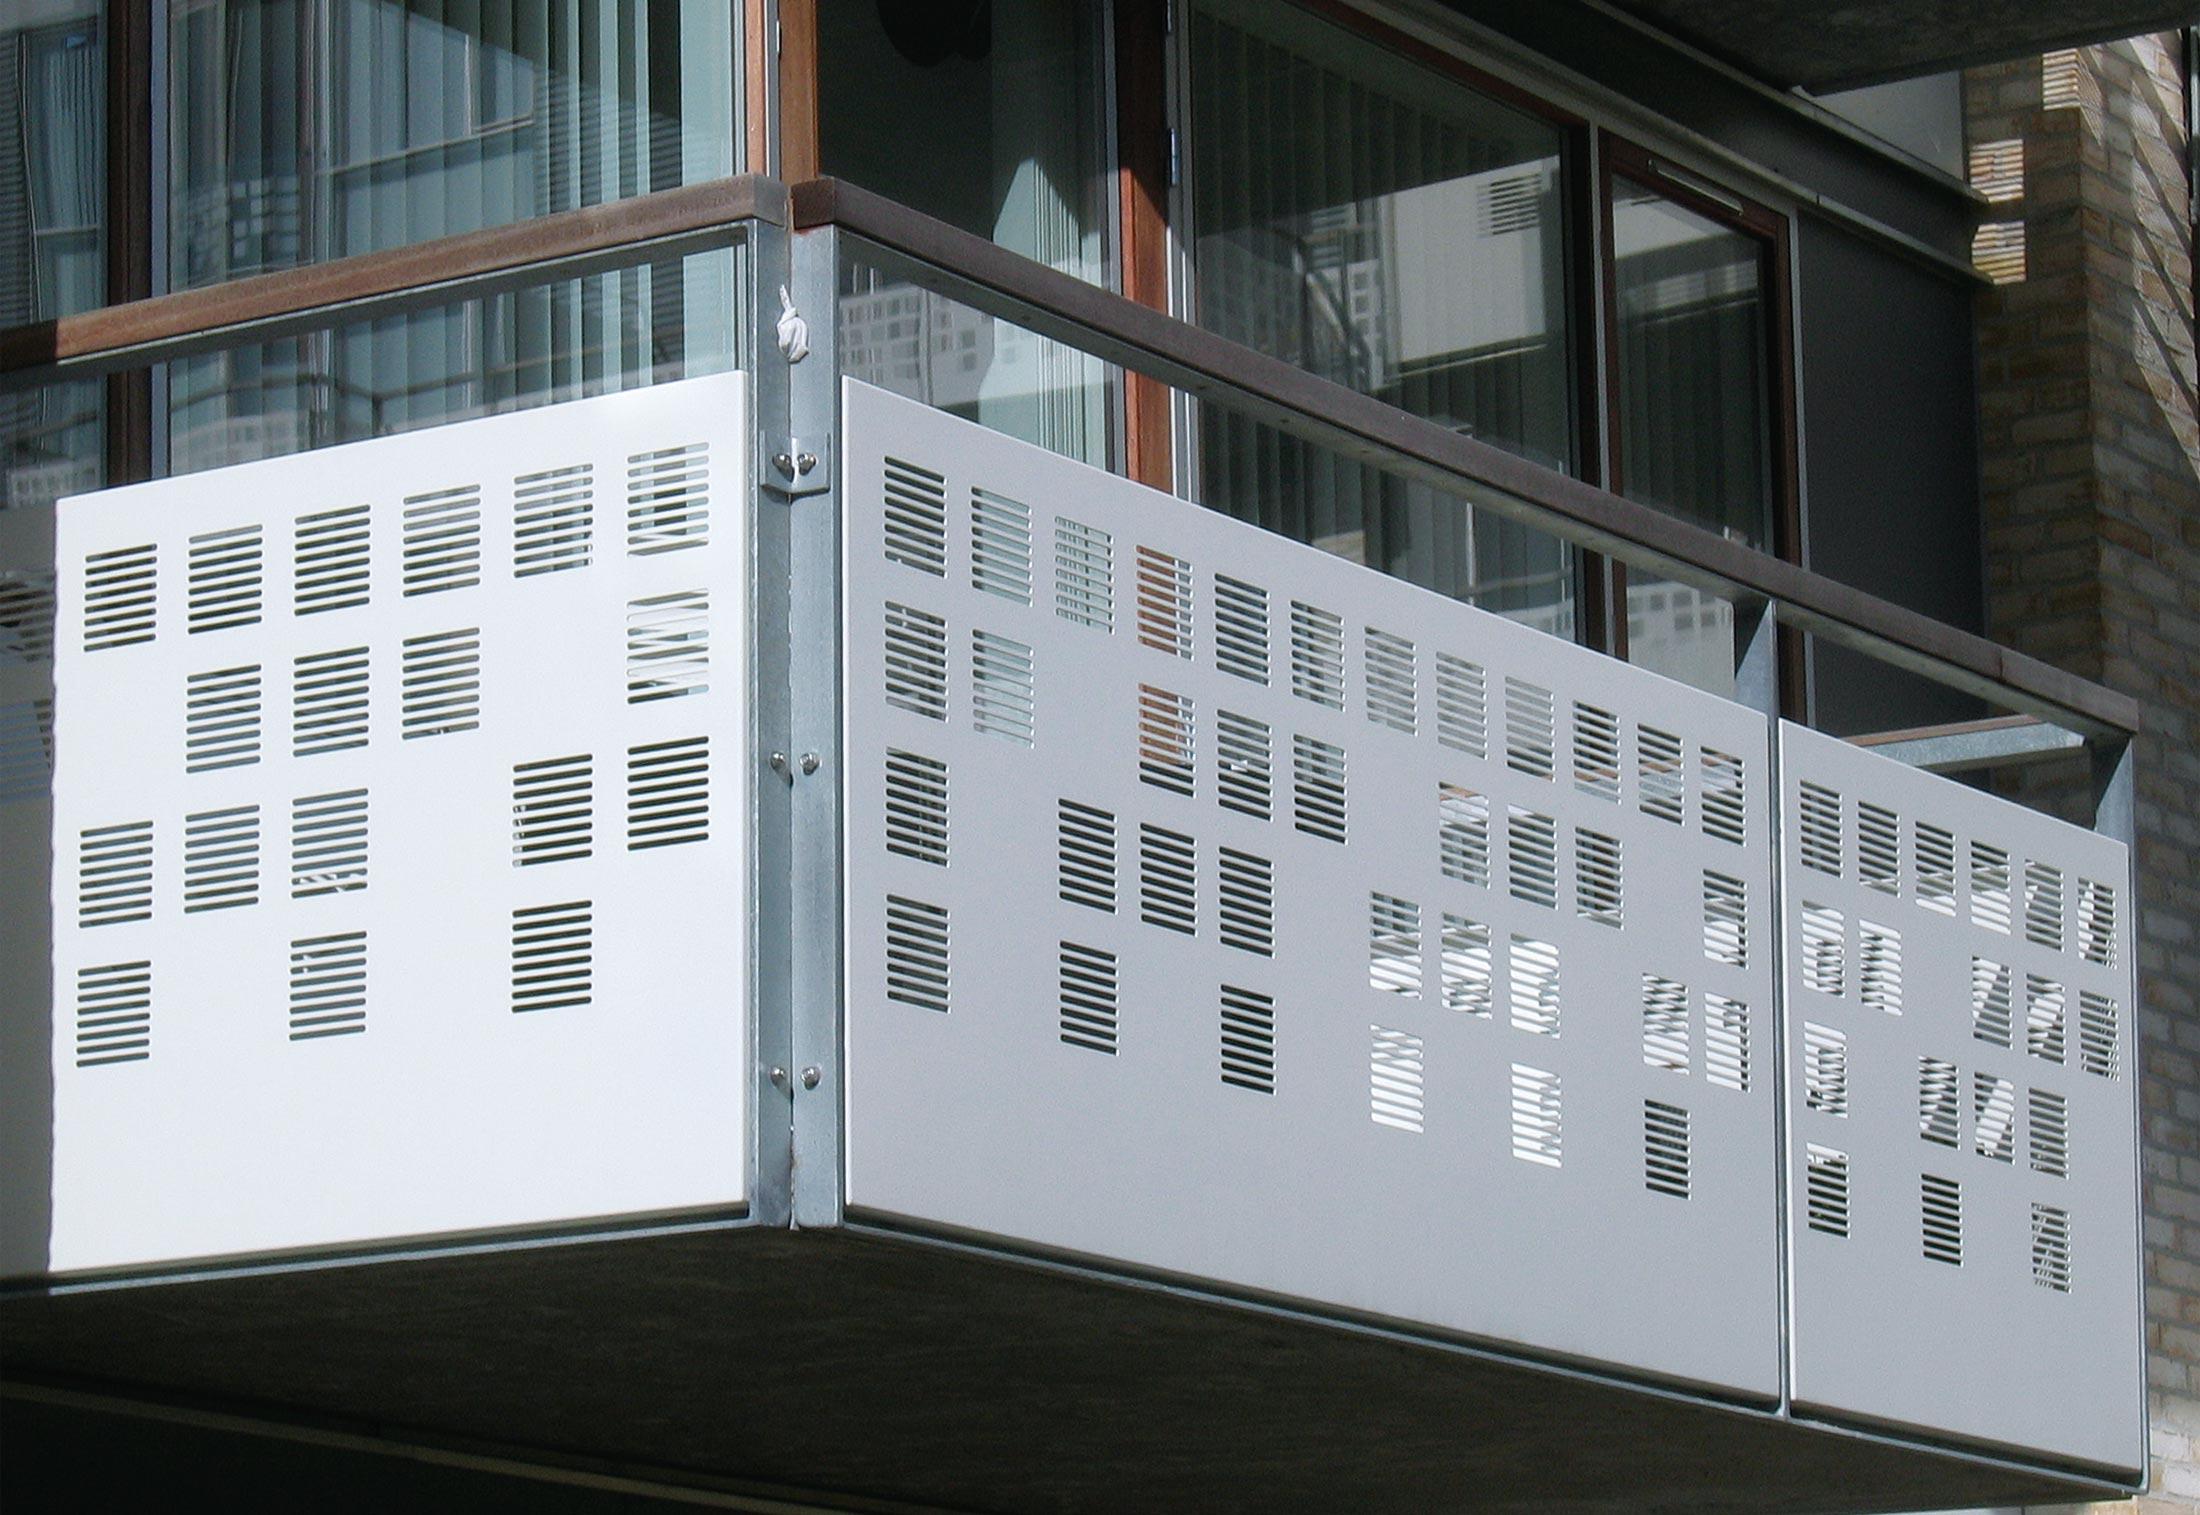 Balkonverkleidung Blech Innenarchitektur Haus Verkleiden